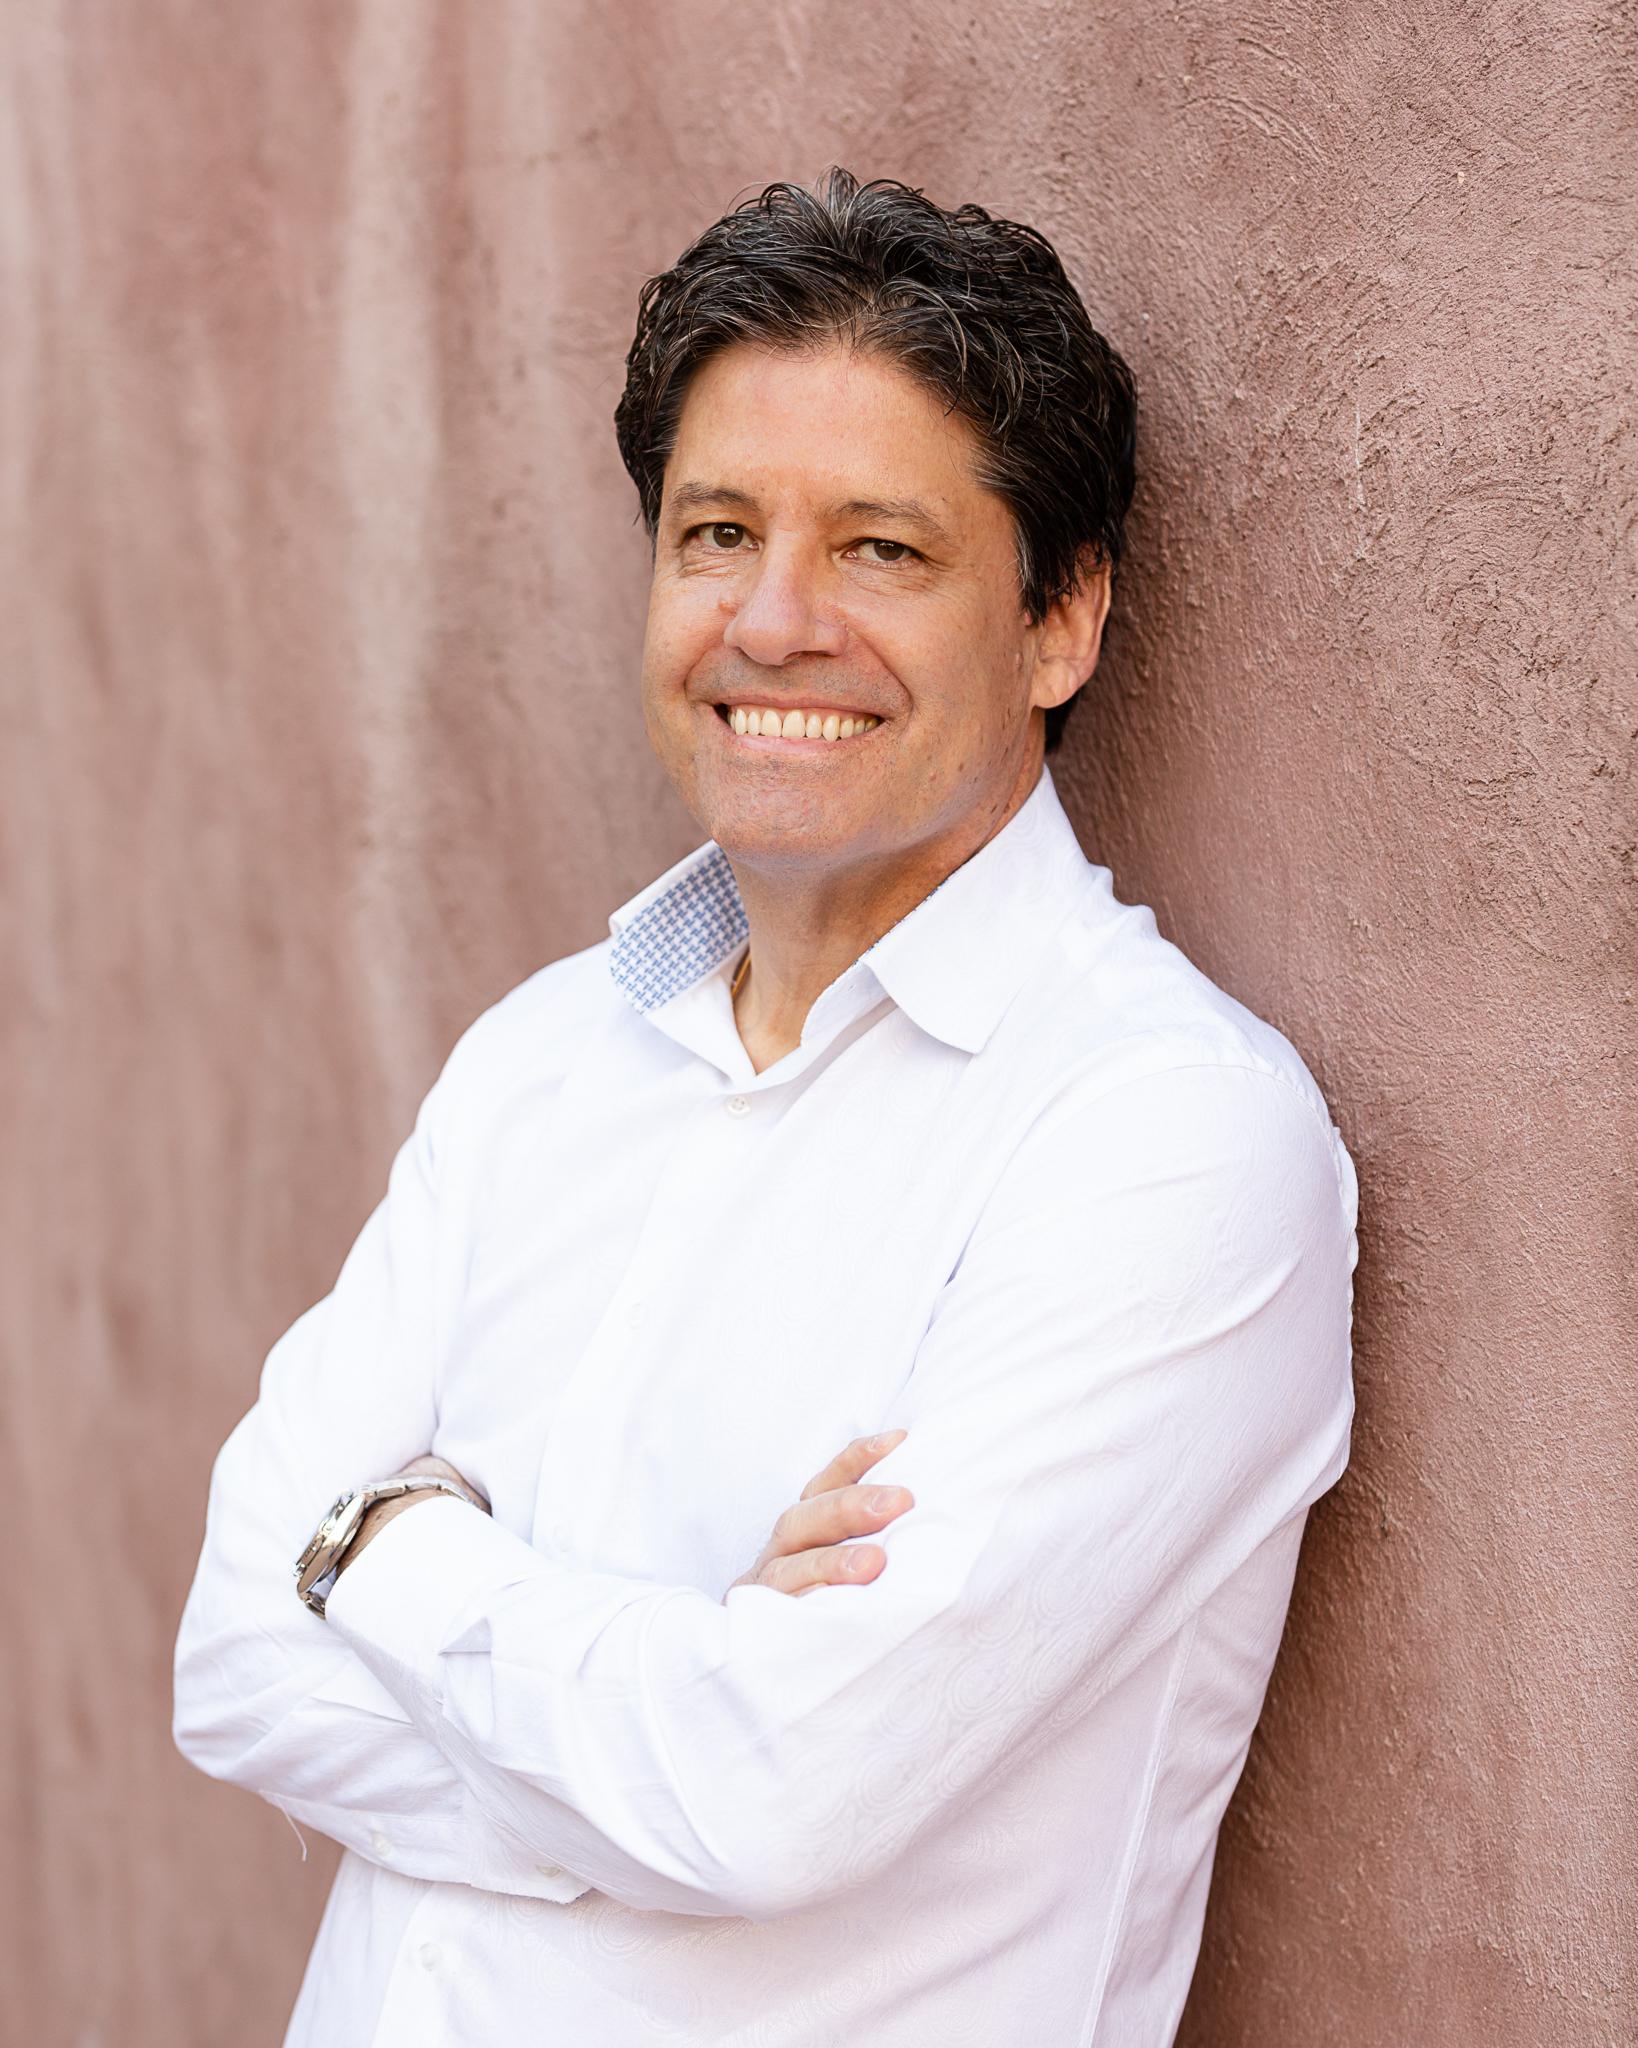 Patrick Maloney, DC, Chiropractor